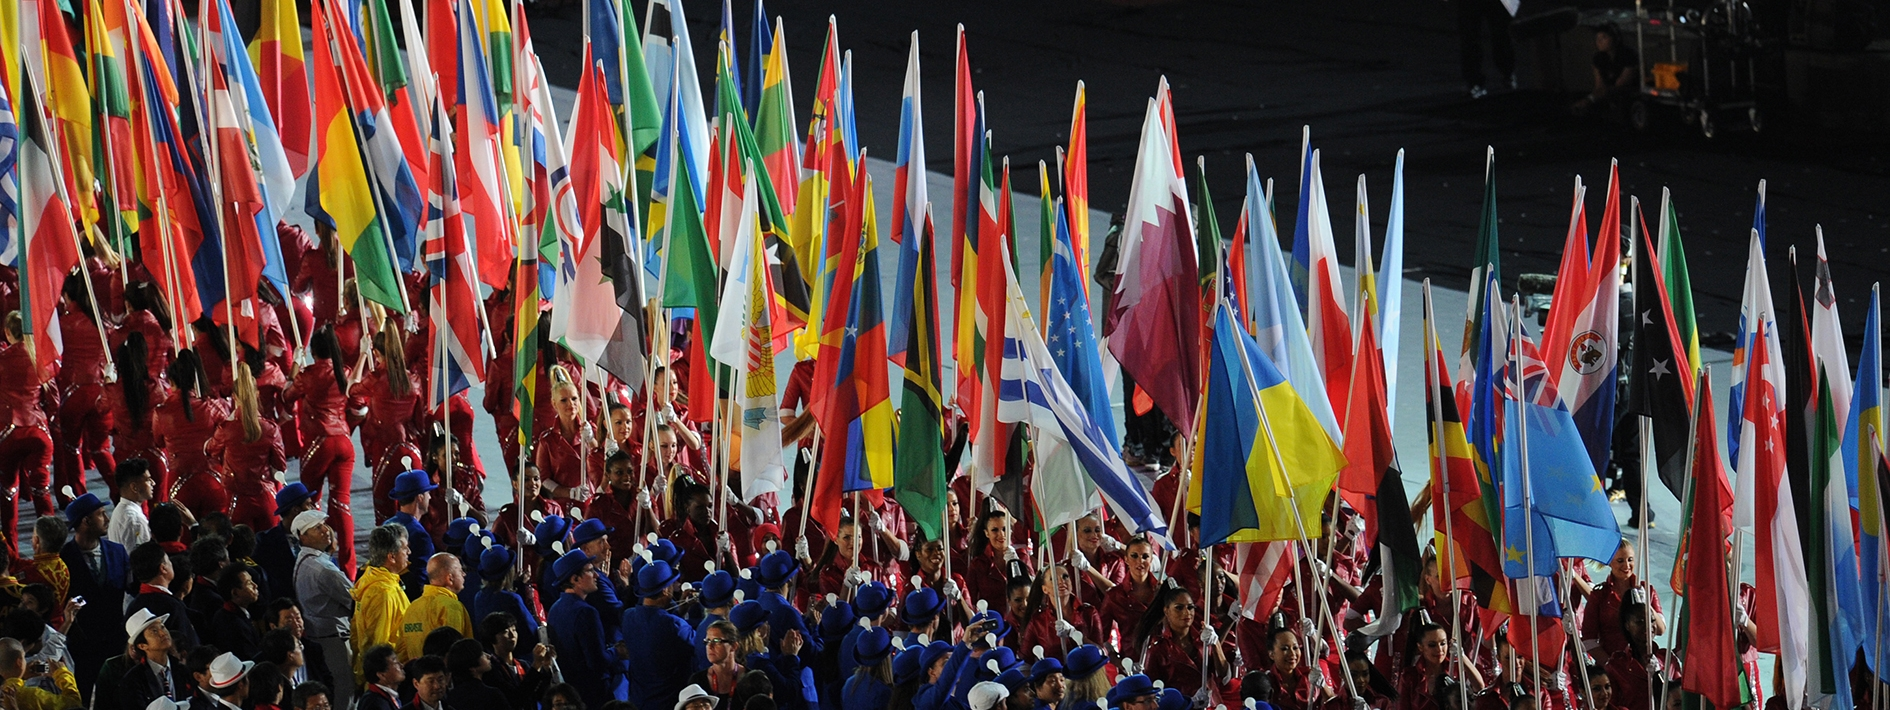 olympia 2019 deutschland